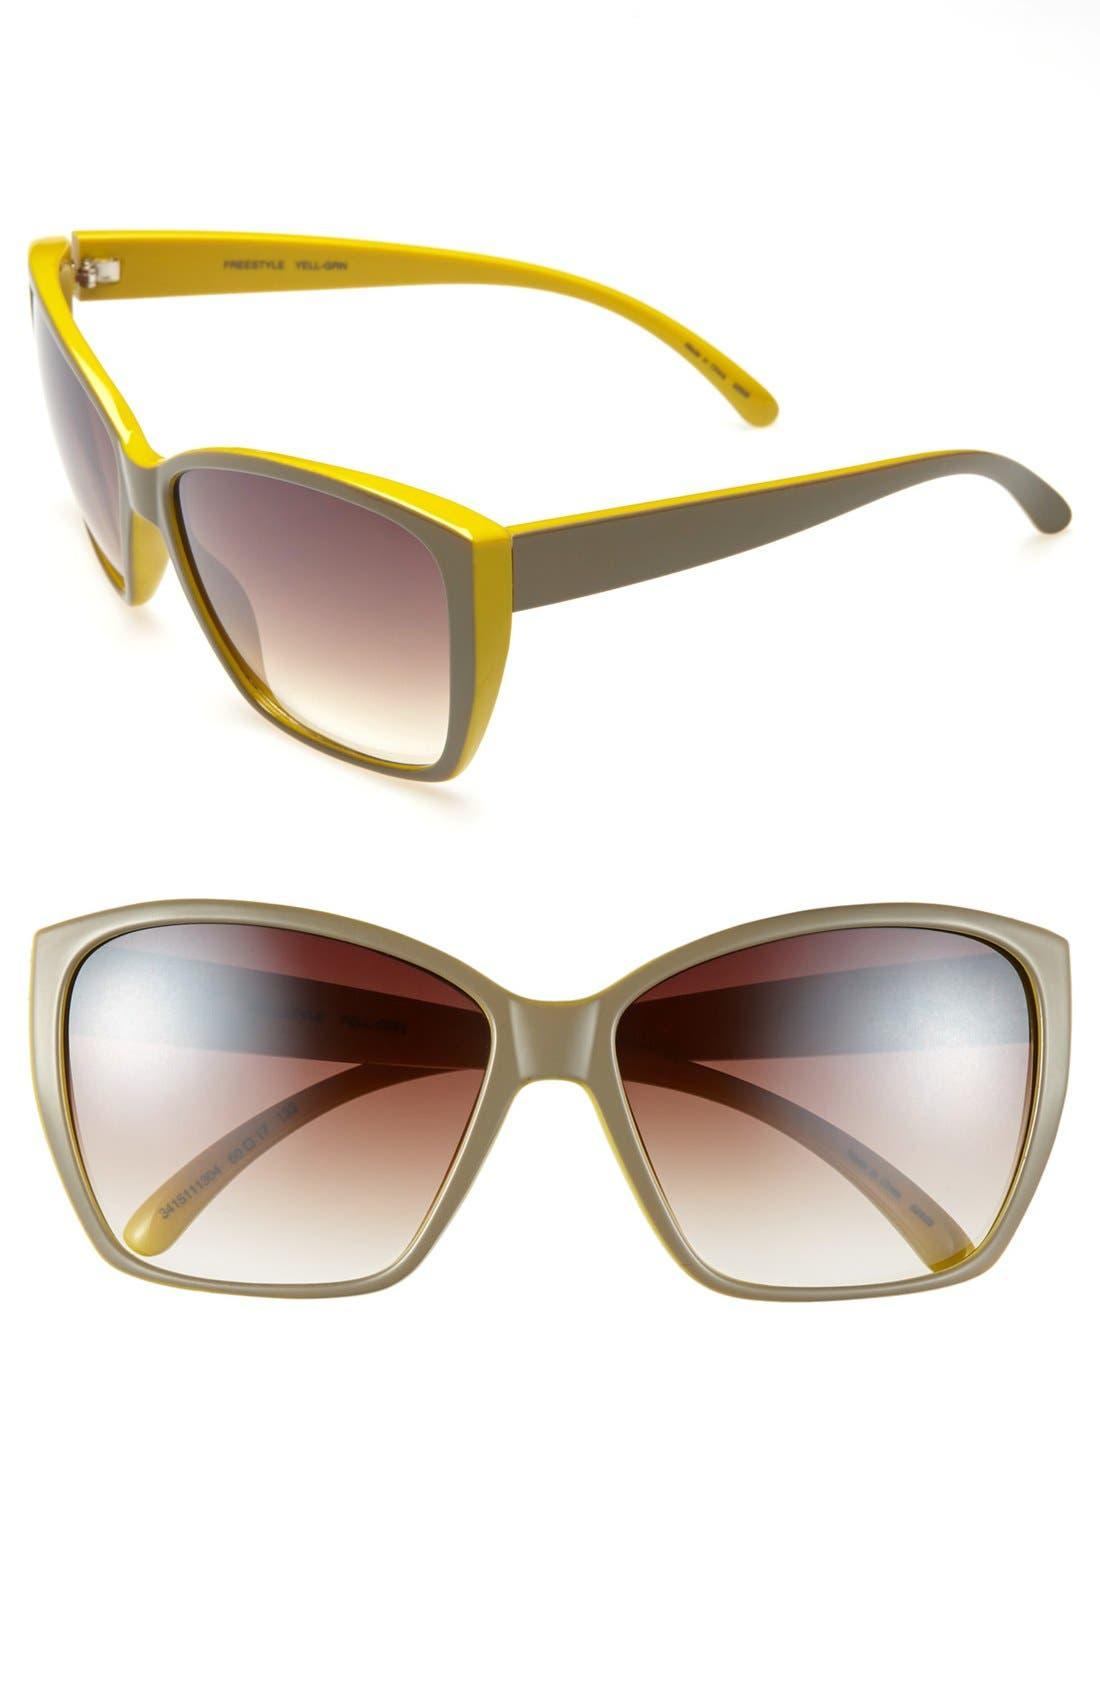 Alternate Image 1 Selected - Outlook Eyewear 'Freestyle' 60mm Sunglasses